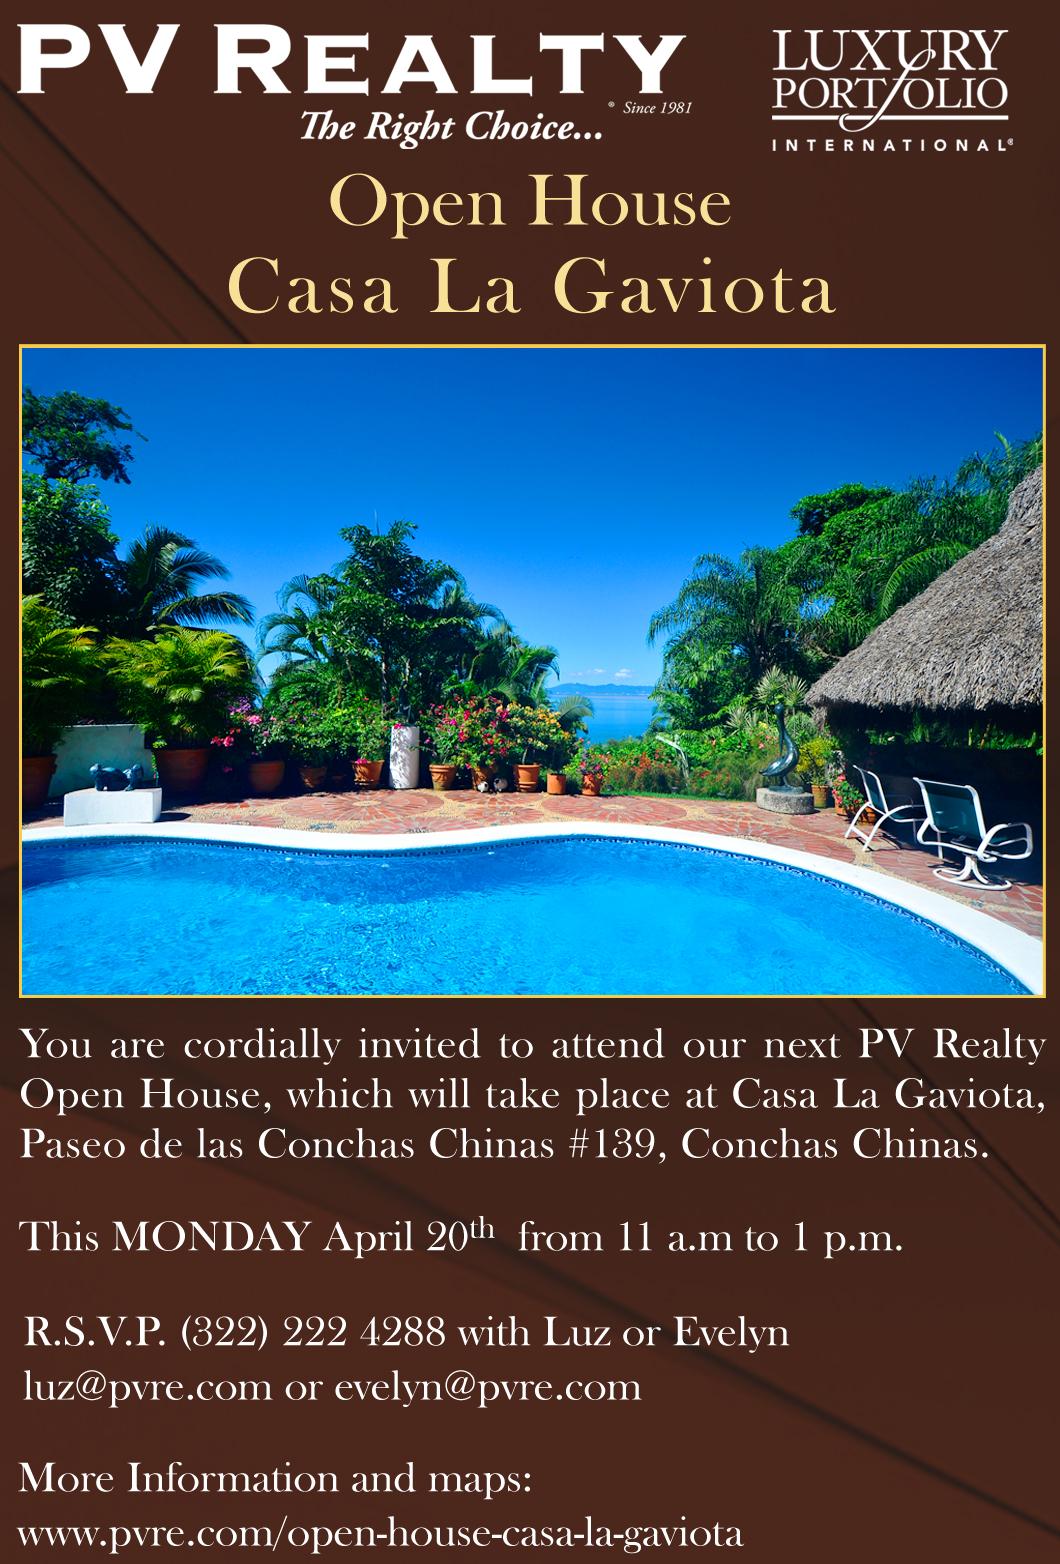 Open-House-Casa-La-Gaviota Open House Casa La Gaviota Open House Casa La Gaviota Open House Casa La Gaviota